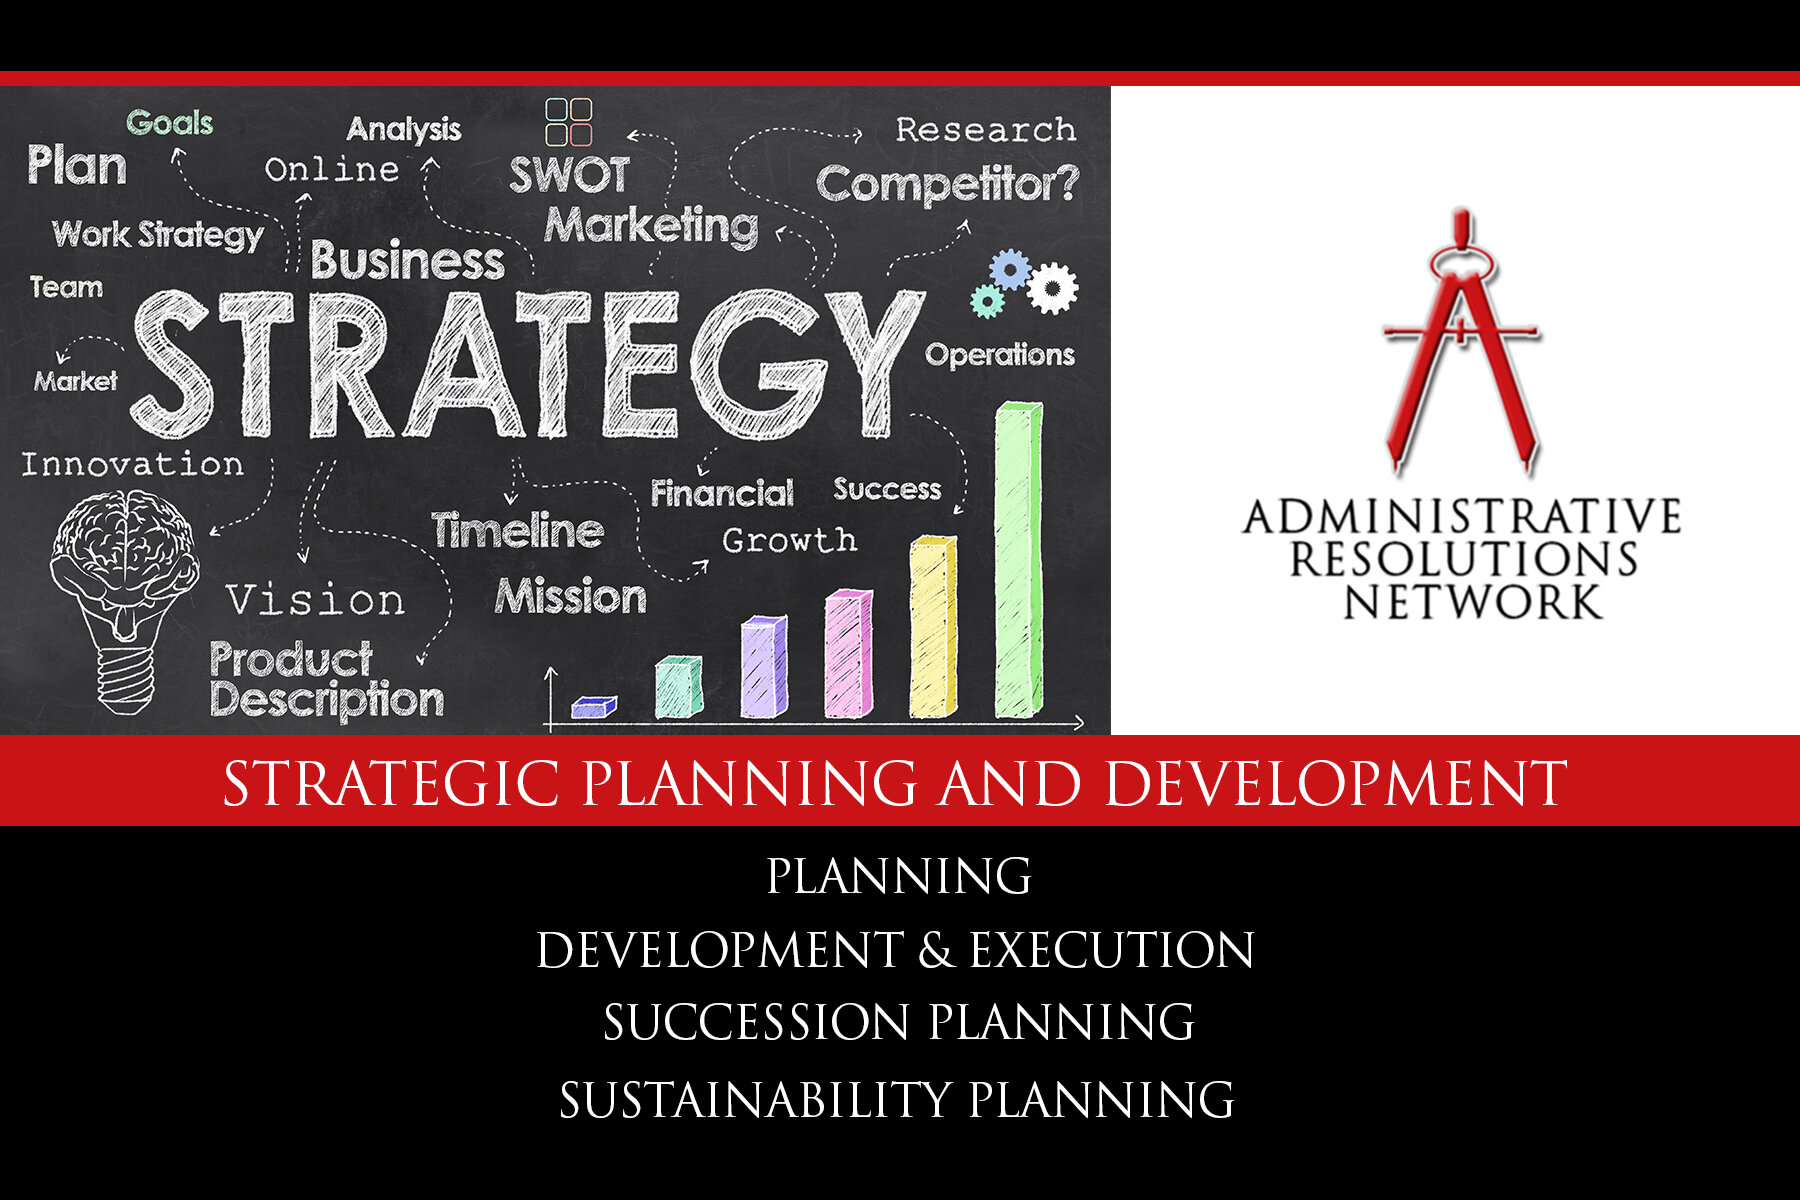 Strategic Planning2.jpg